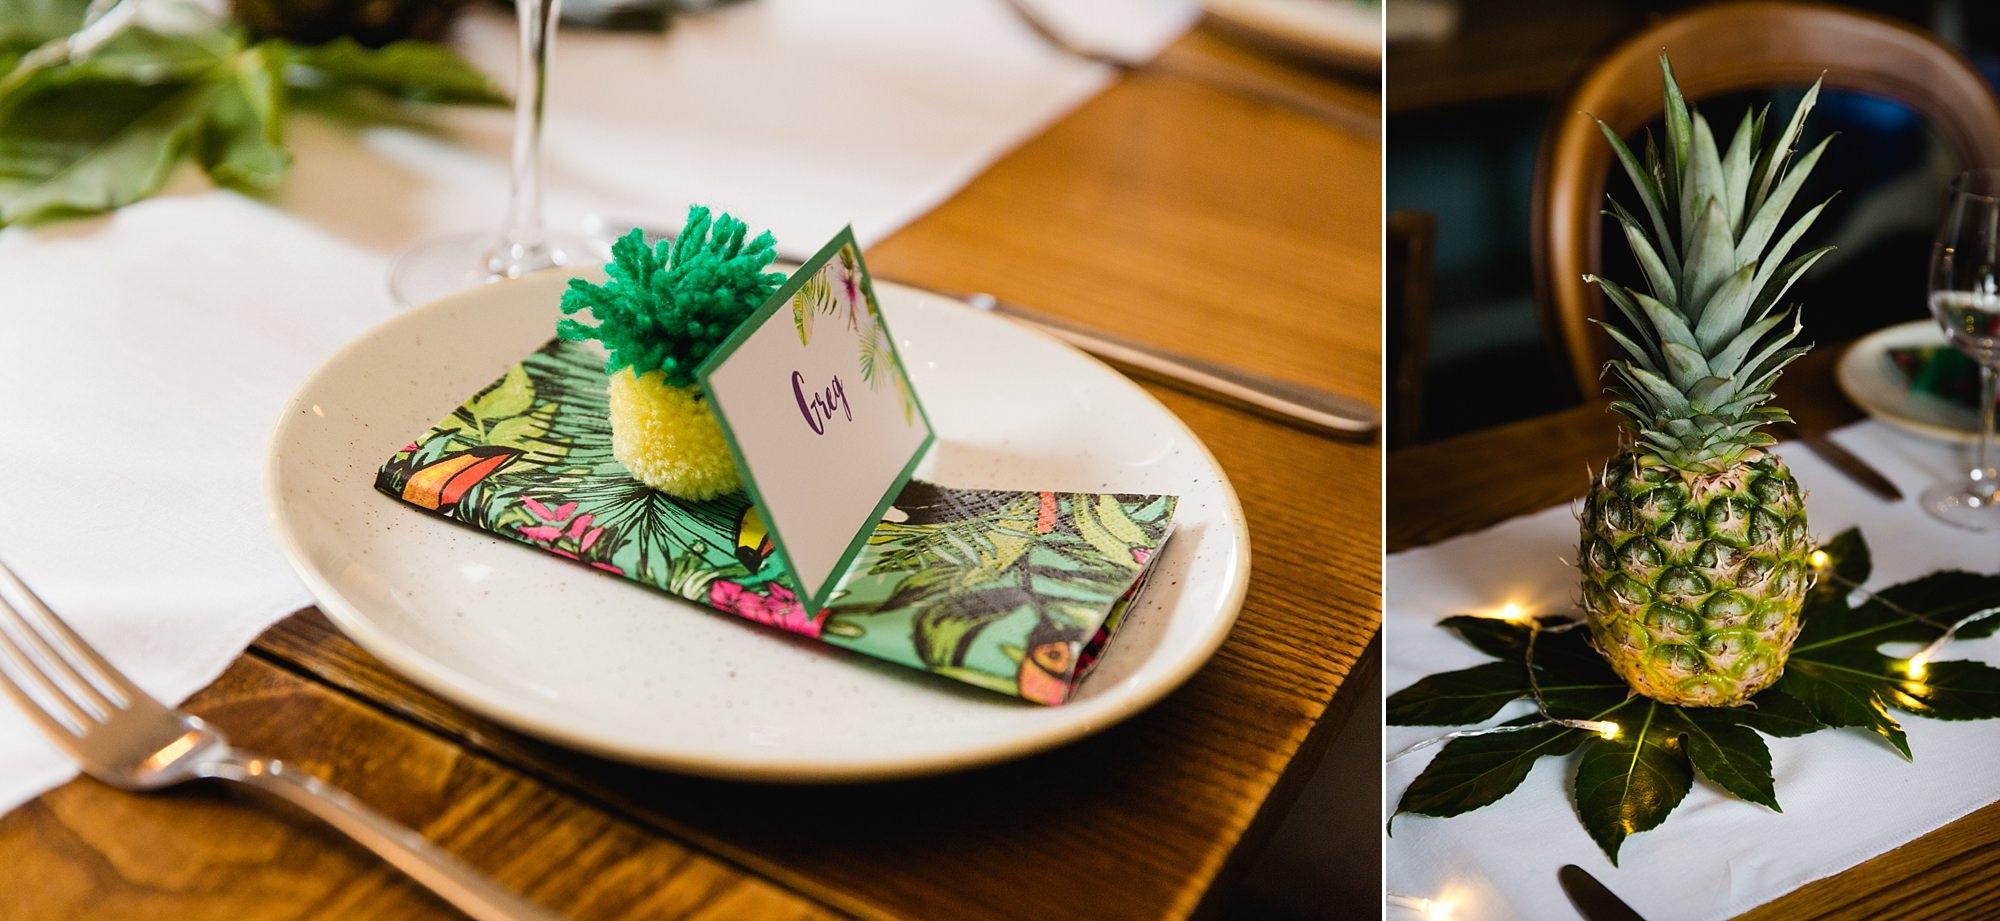 The Grange Ealing wedding handmade fruit table decorations